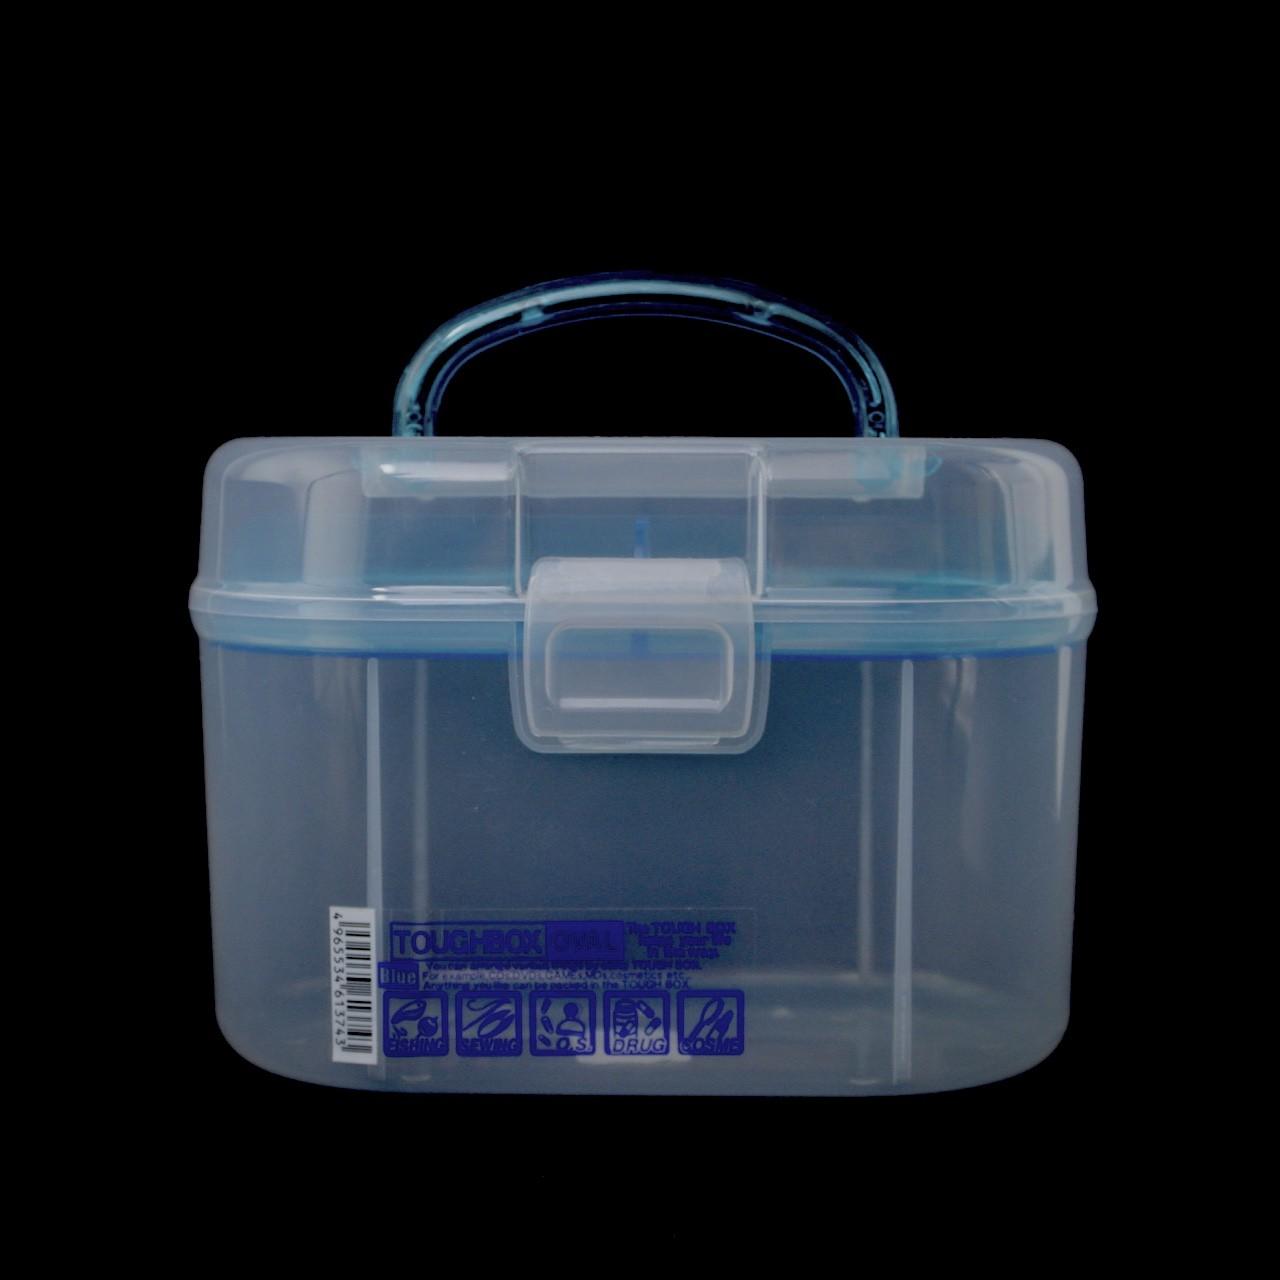 YAMADA TOUGH BOX OVAL COM ALCA 613 AZUL